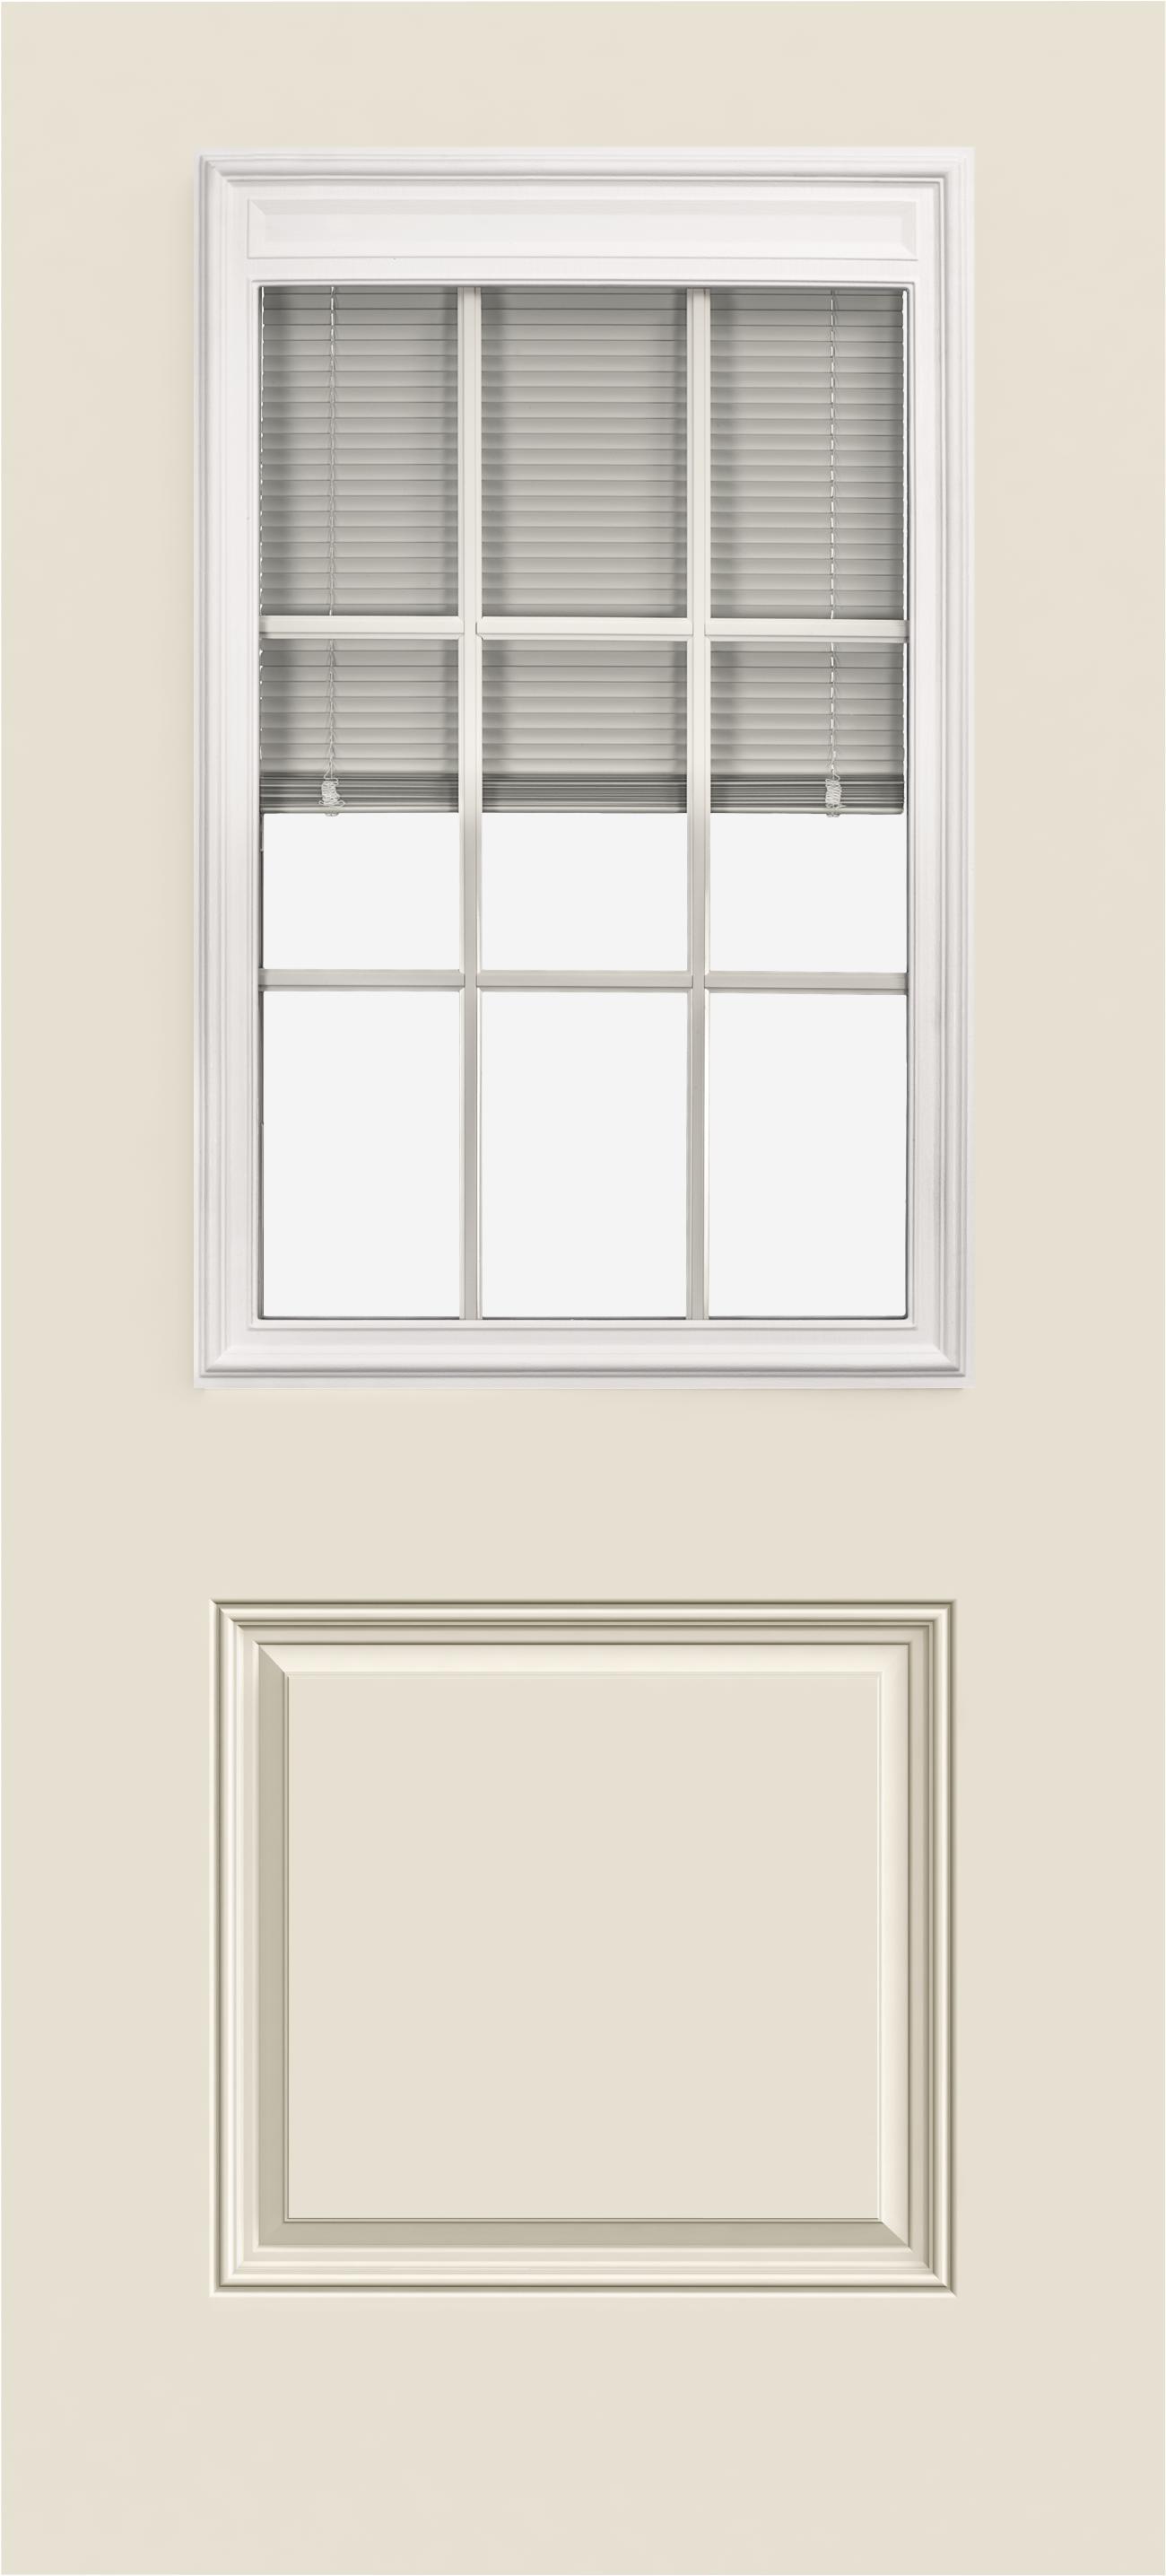 Smooth Pro Fiberglass Exterior Doors 1 2 View Blinds 9 Light 1 Panel Reliable And Energy Efficient Doors And Windows Jeld Wen Windows Doors